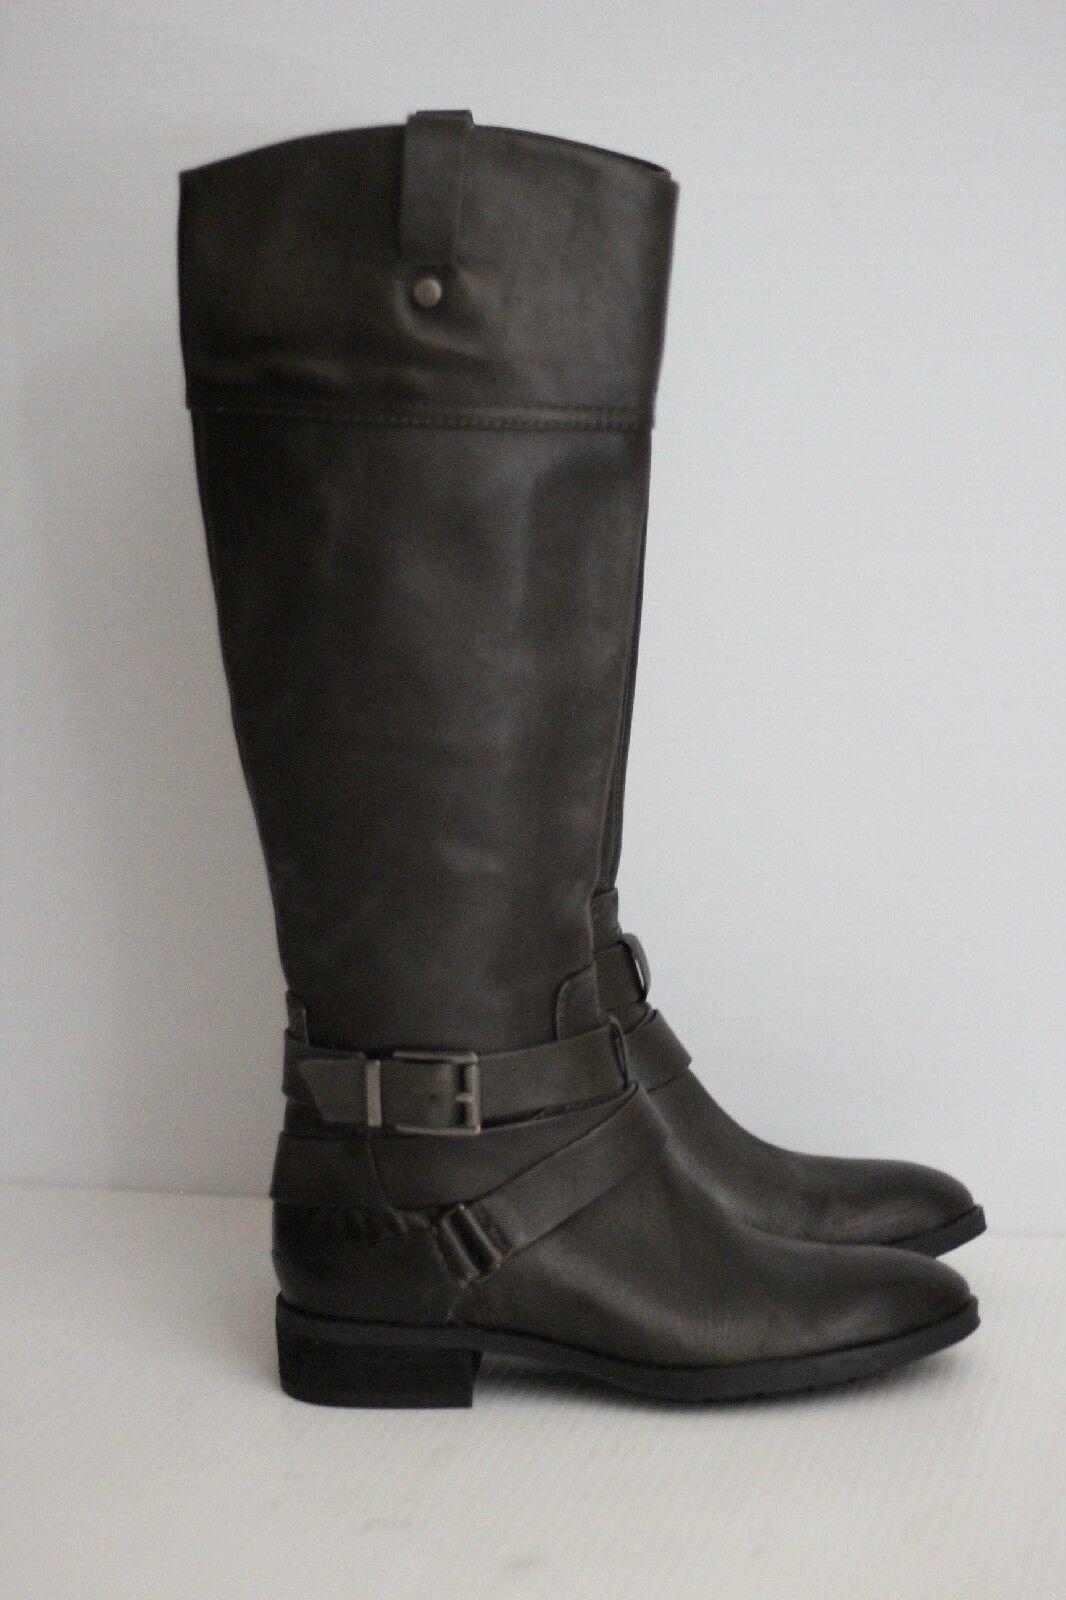 NEW Vince Camuto 'Pazell' Tall Buckle Strap Boot - Dark Grau - Größe 5.5 M